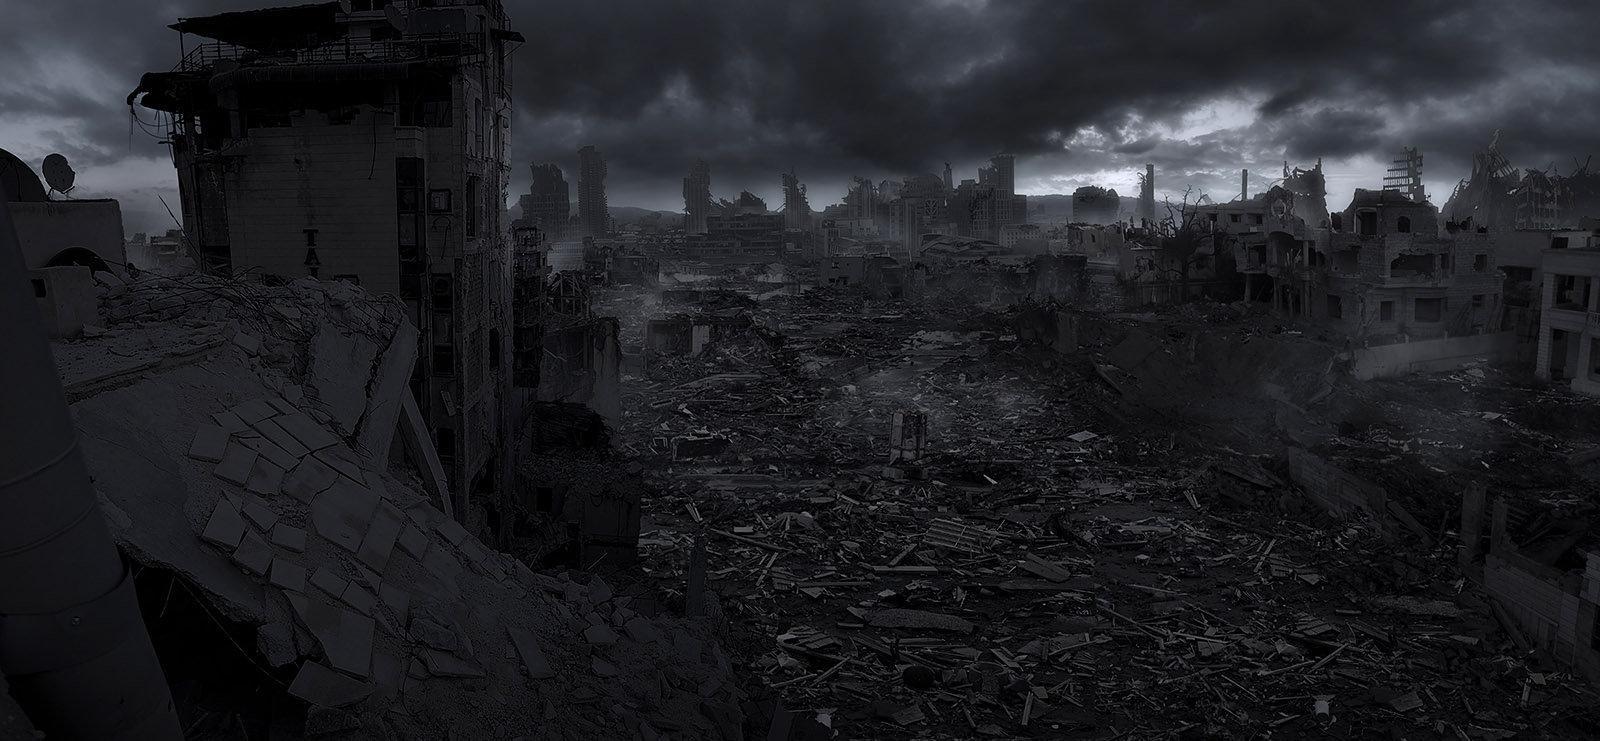 Jacek irzykowski post apocalyptic world